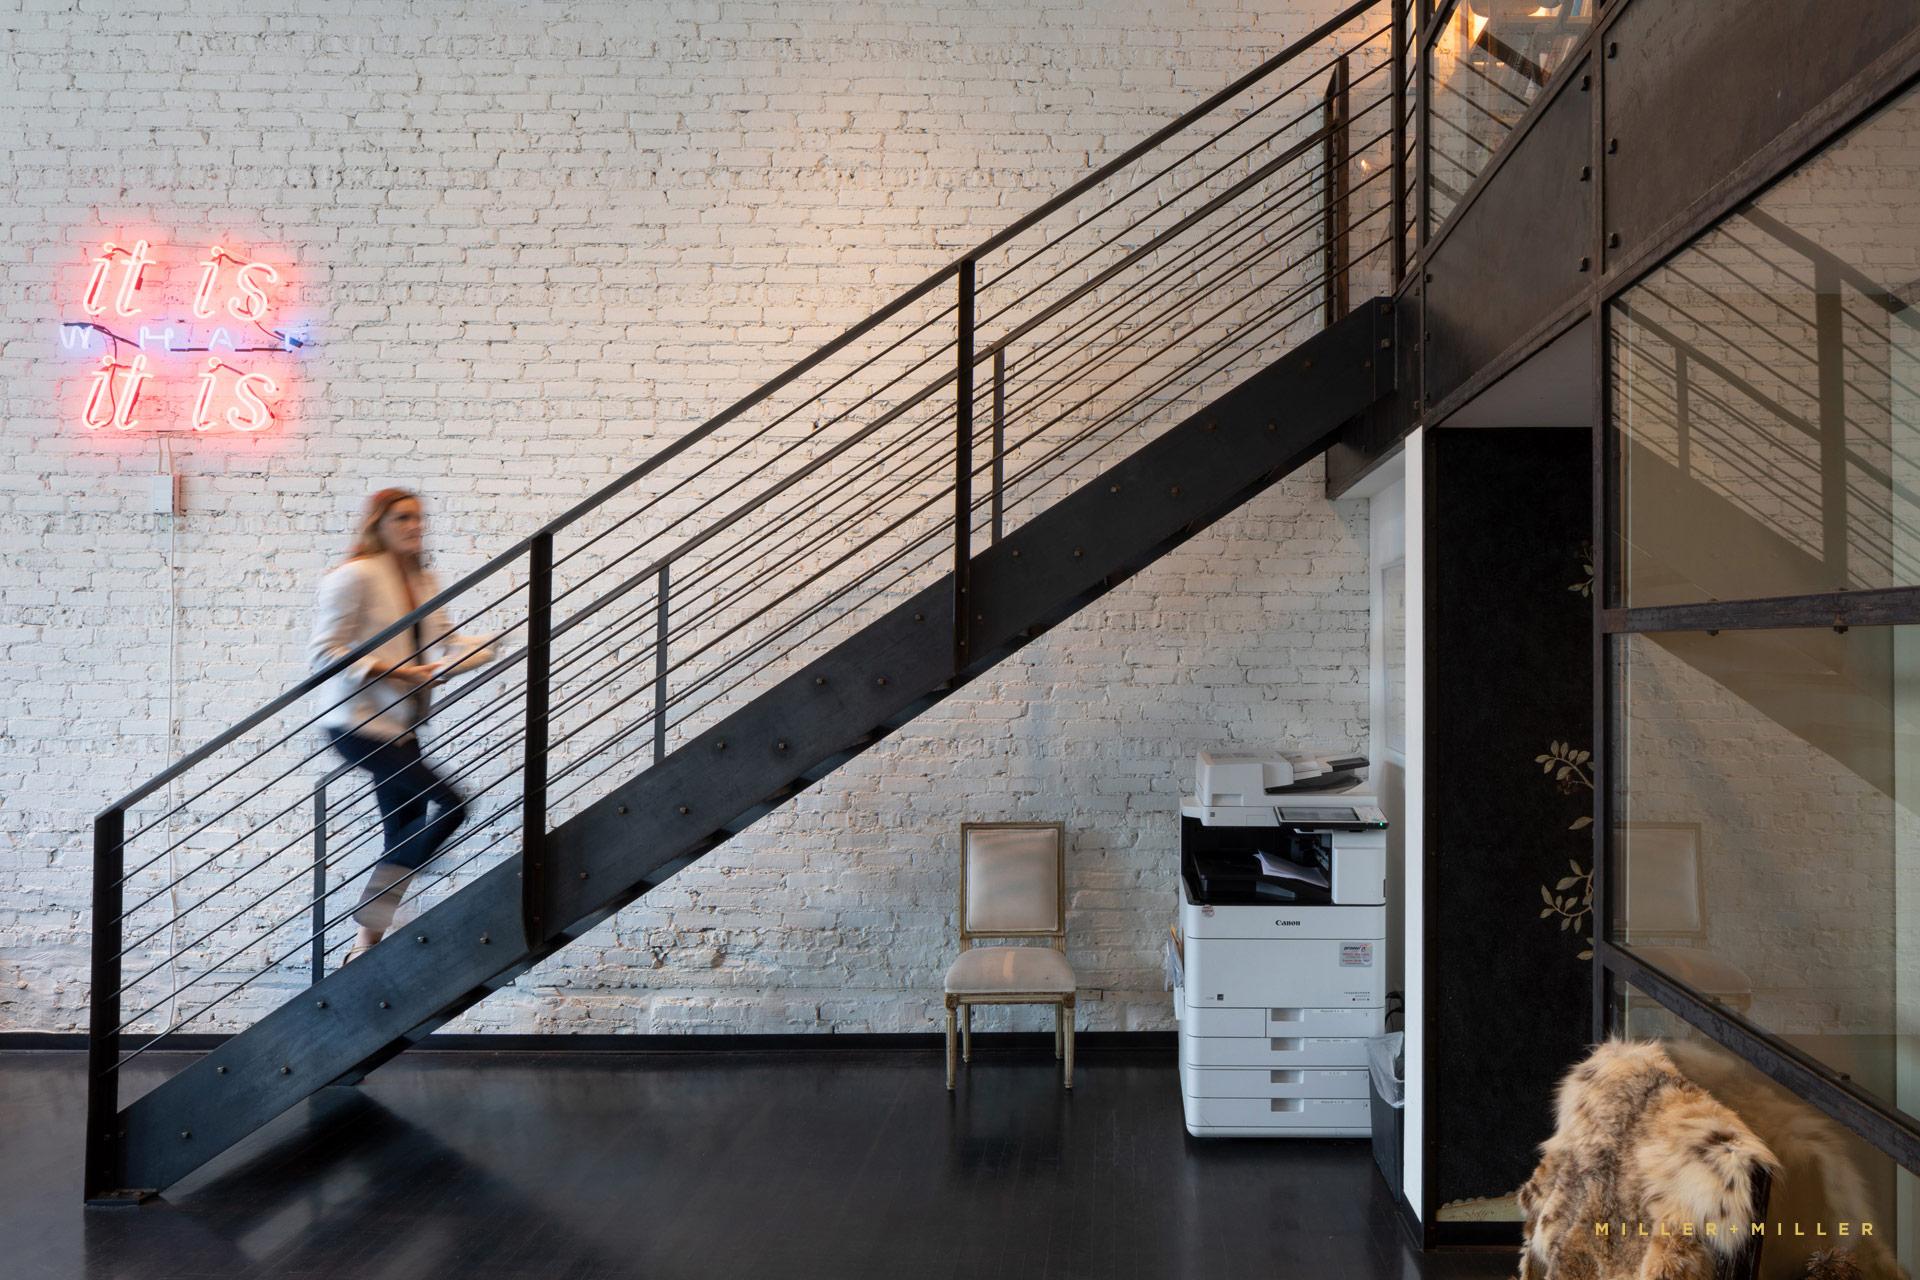 Steel Metal Stairs Staircase Bricks Neon Sign